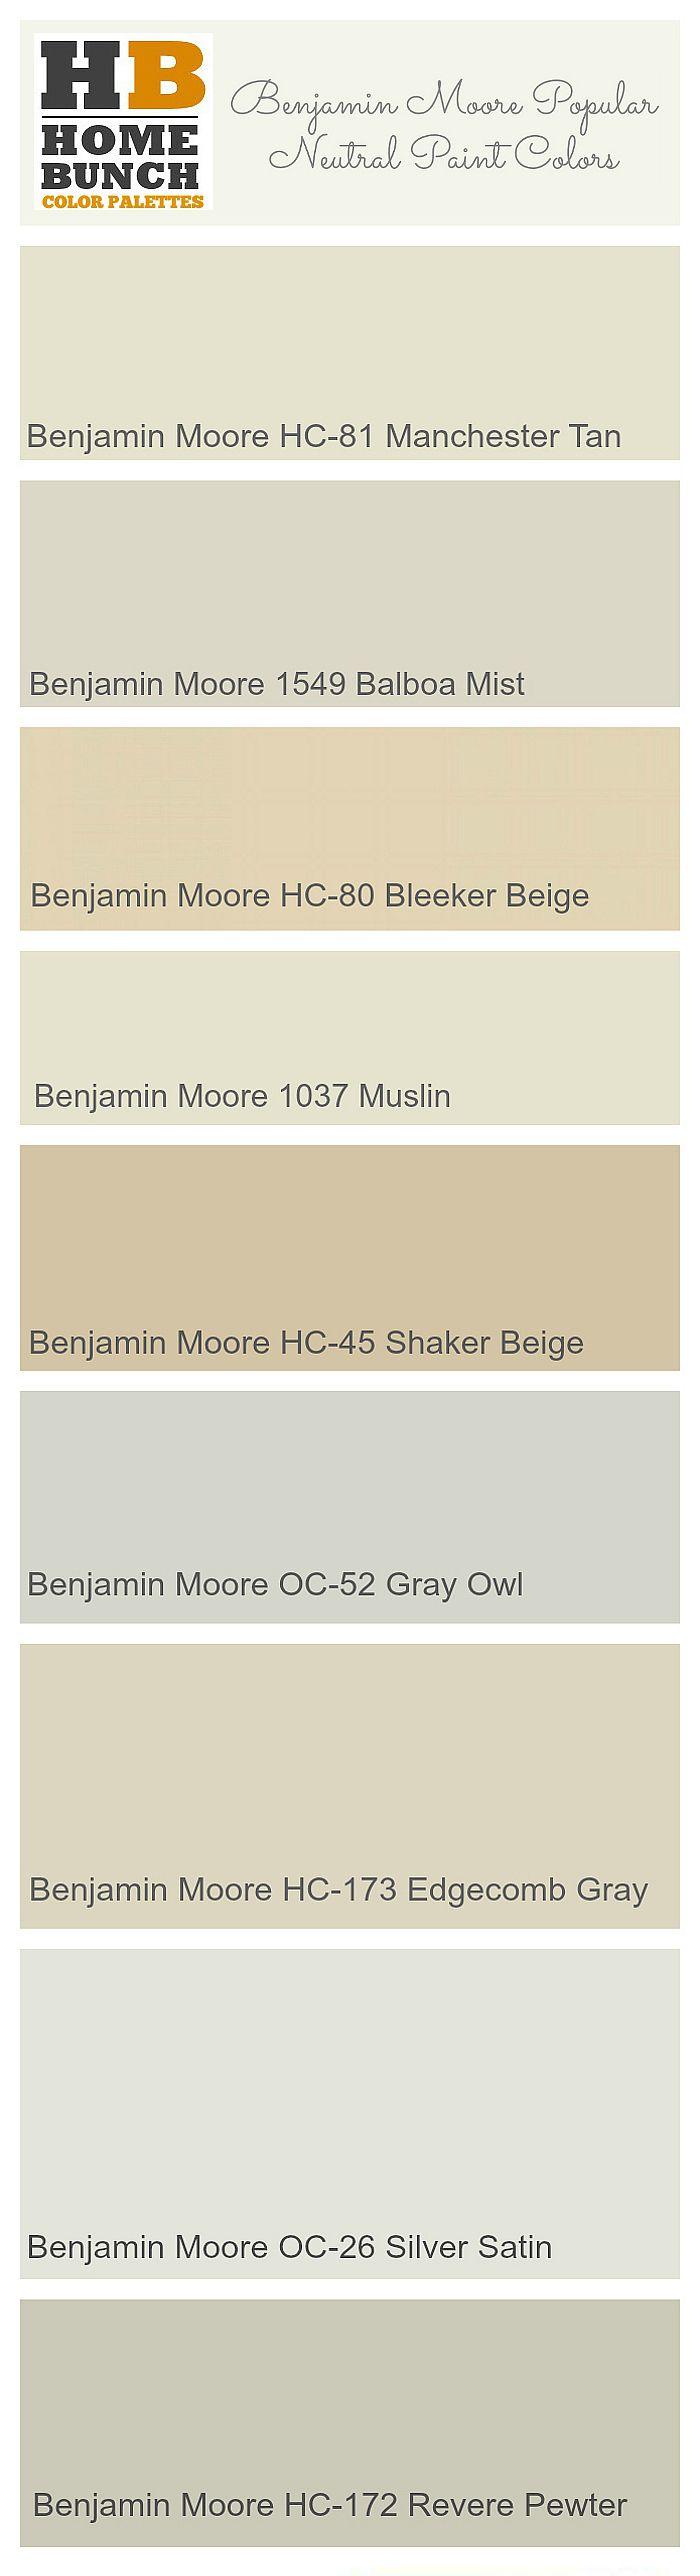 Benjamin Moore Popular Neutral Paint Colors. Manchester Tan, Balboa Mist, Bleeker Beige, Muslin,   Shaker Beige, Gray Owl, Edgecomb Gray, Silver Satin, Revere Pewter